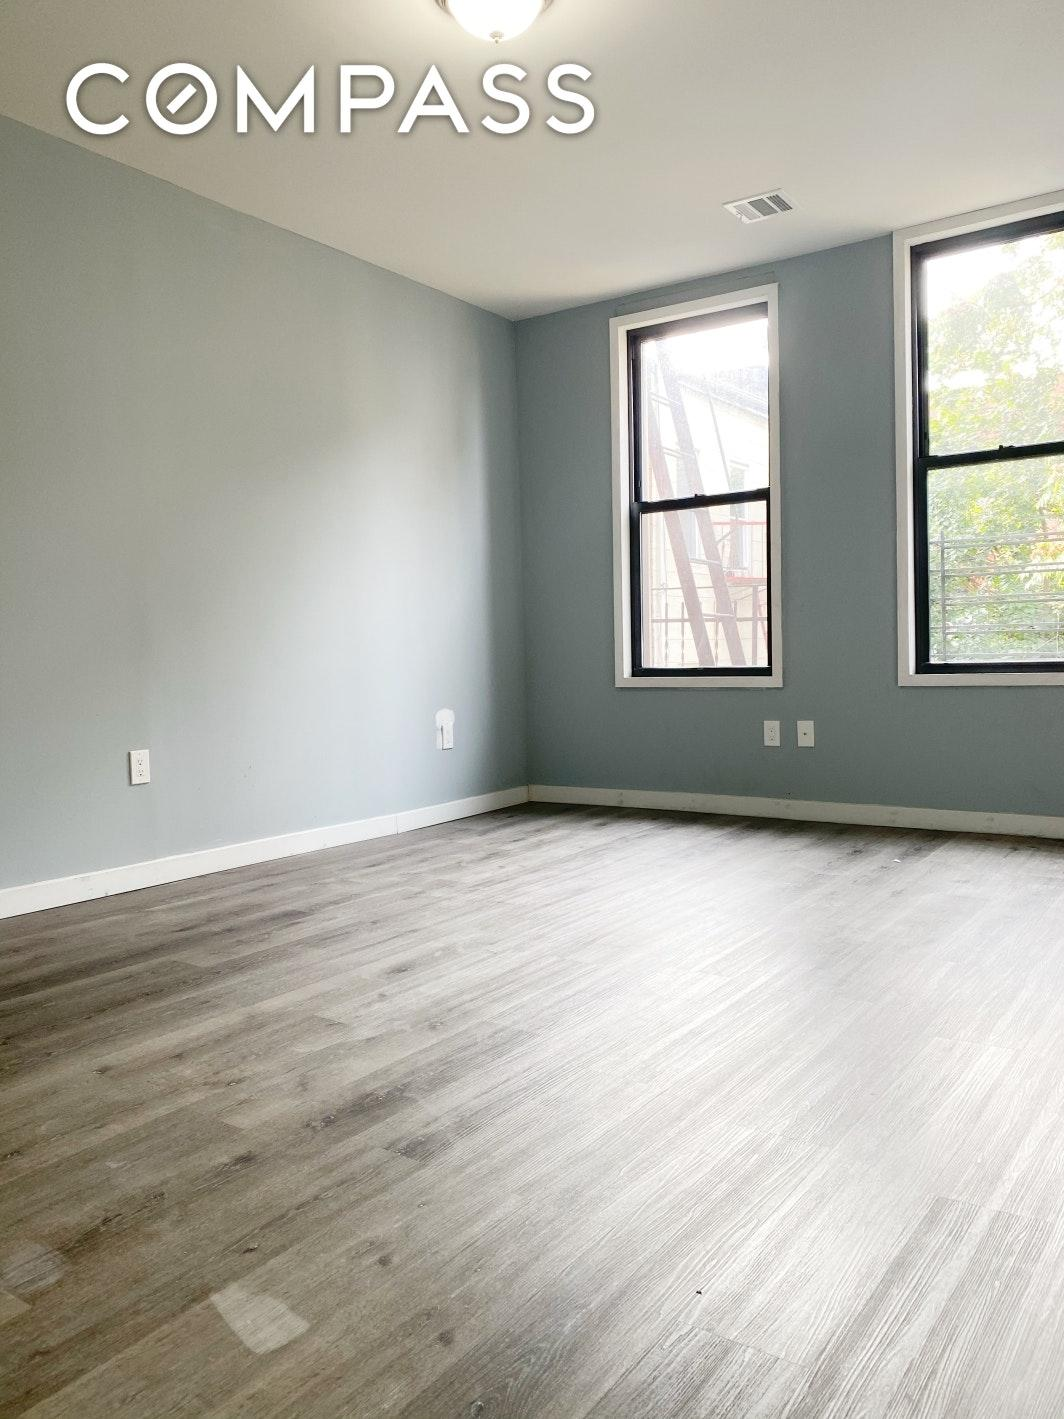 840 E 156th Street Unit: 3 photo